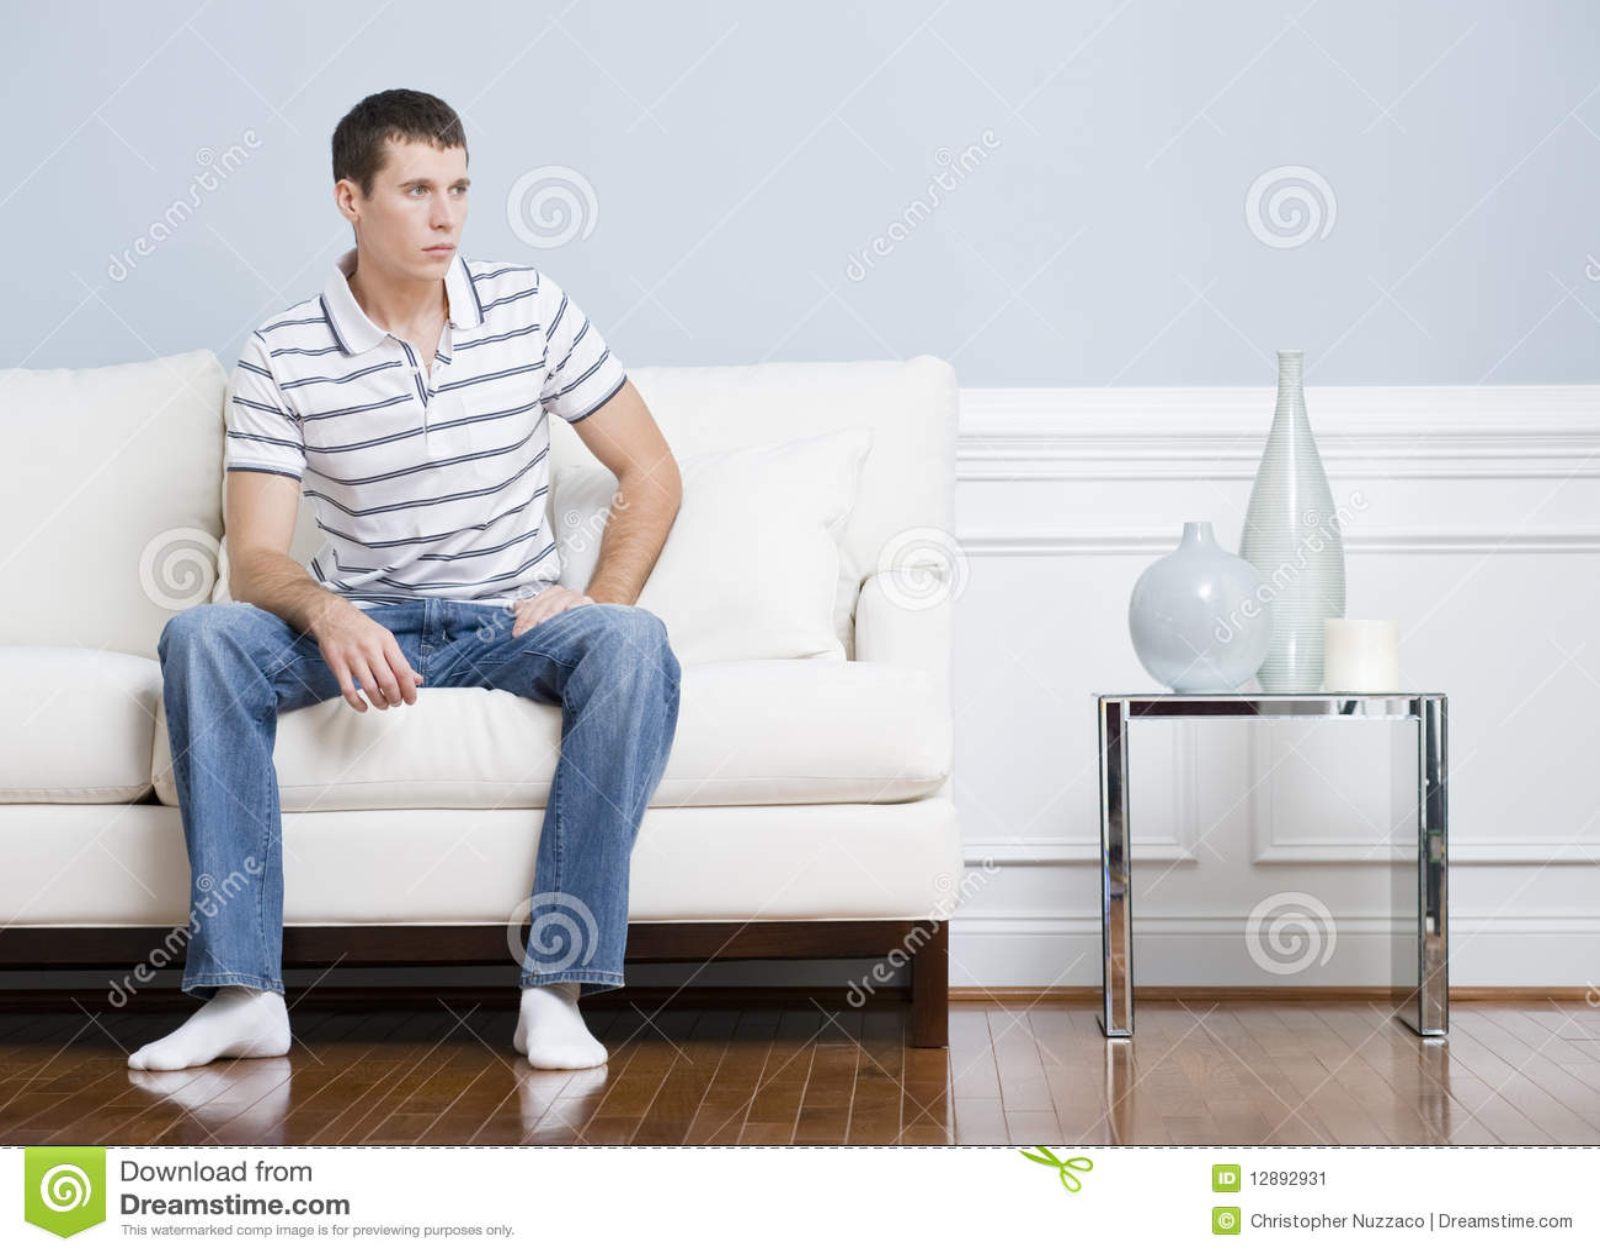 Man Sitting In Living Room